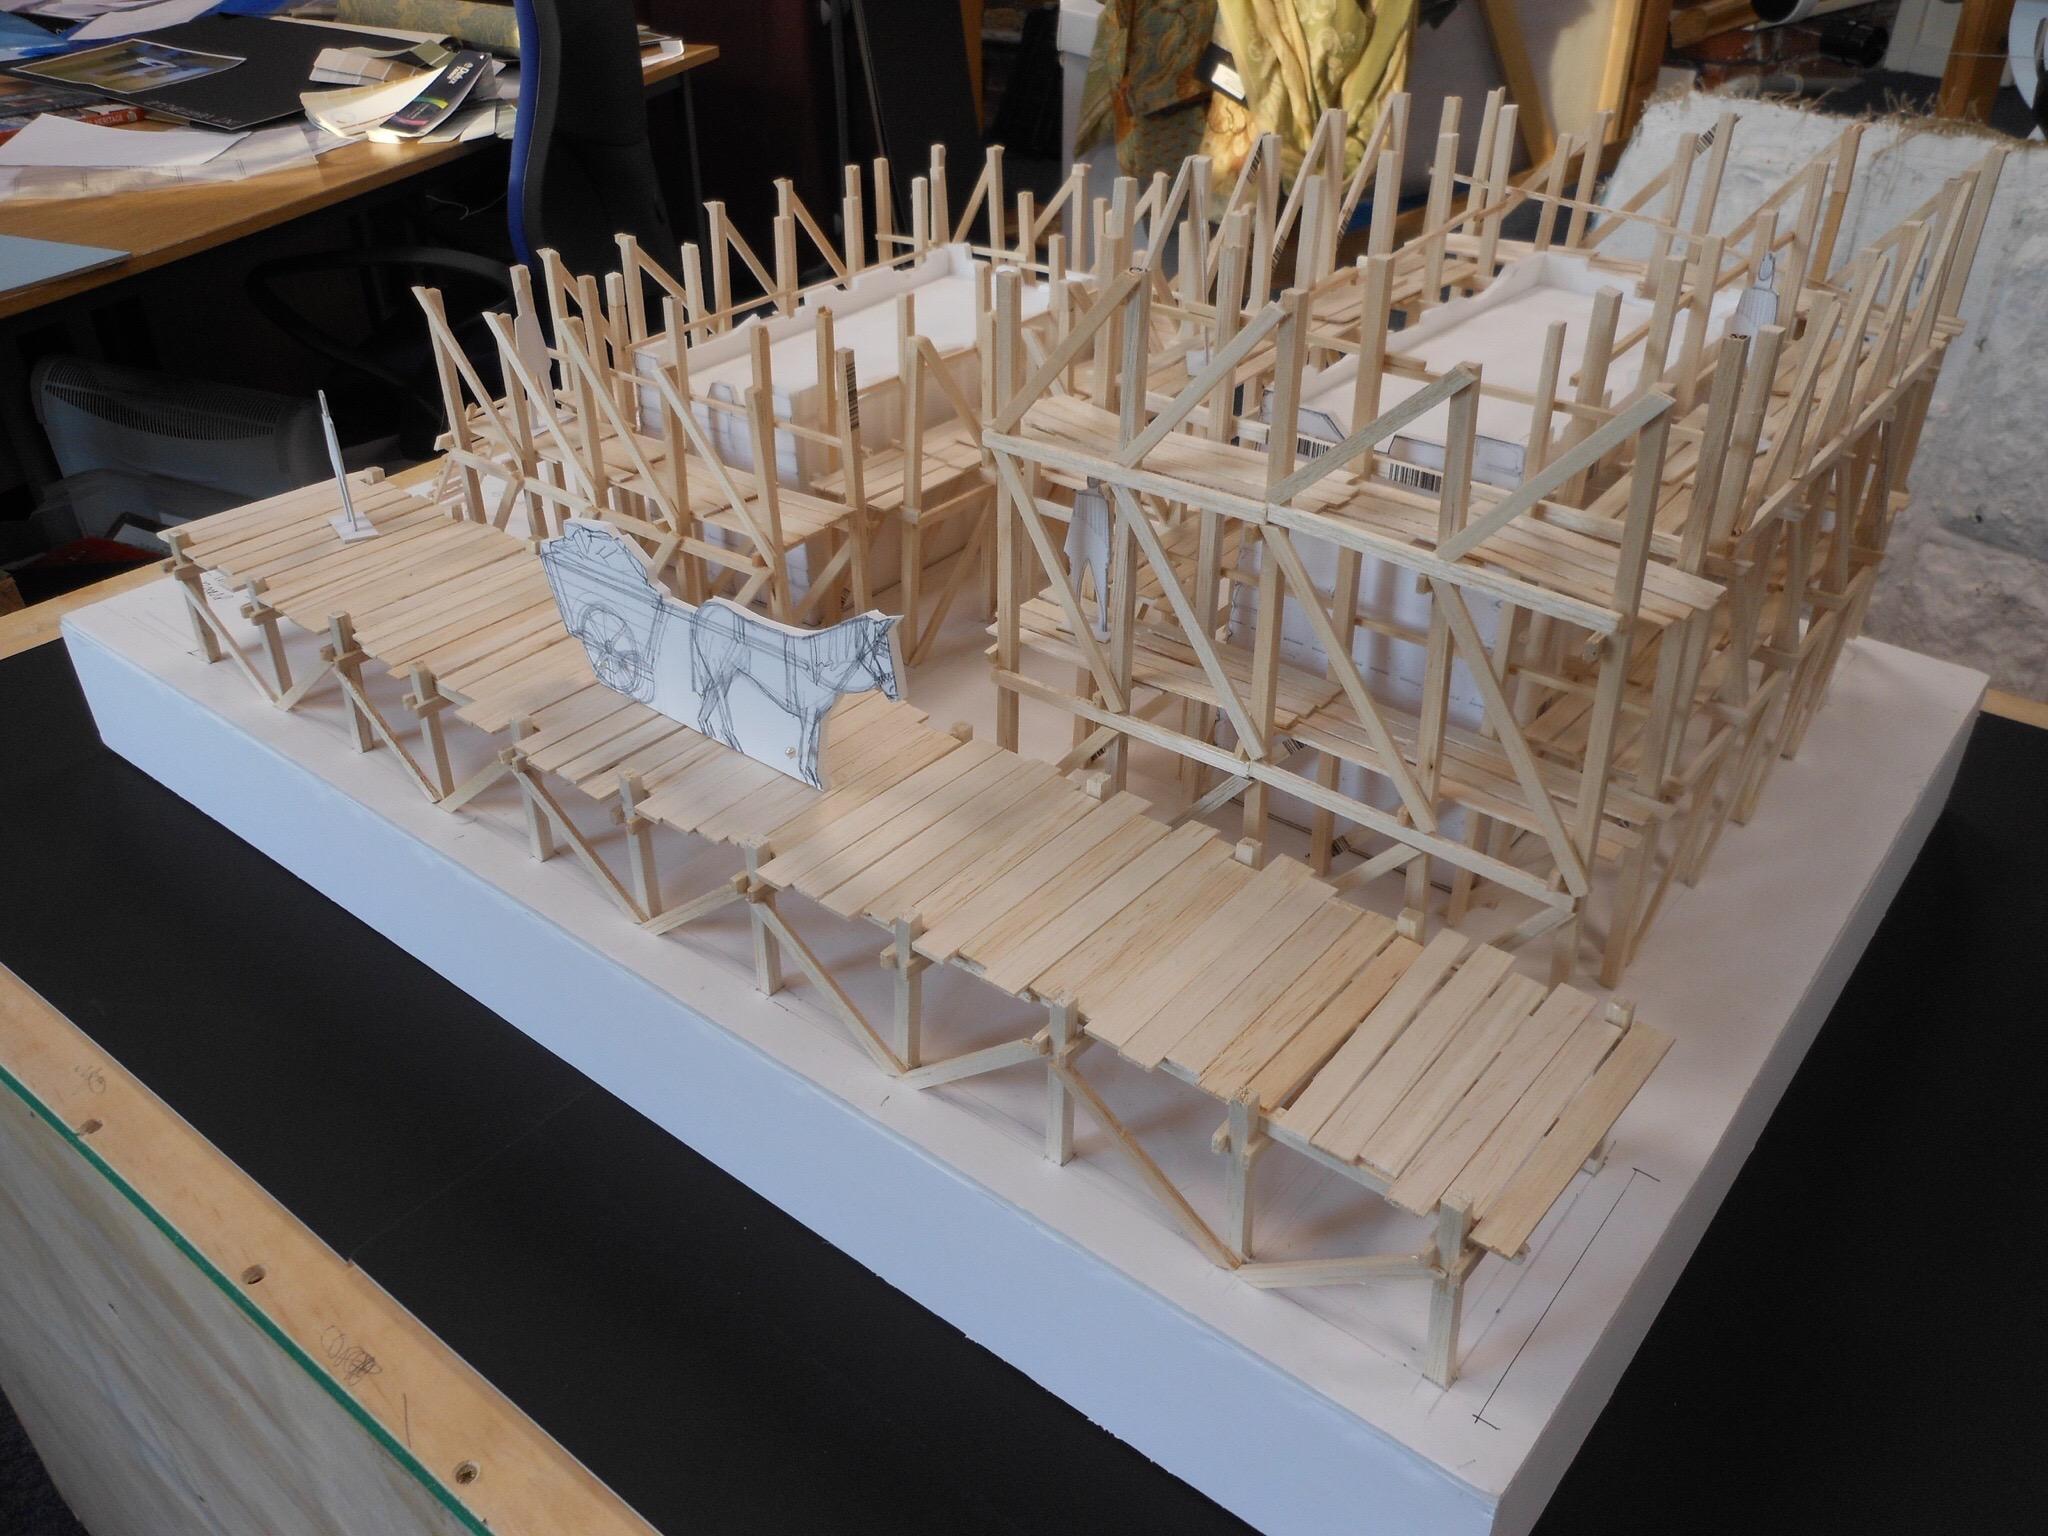 Jericho - Viaduct Model